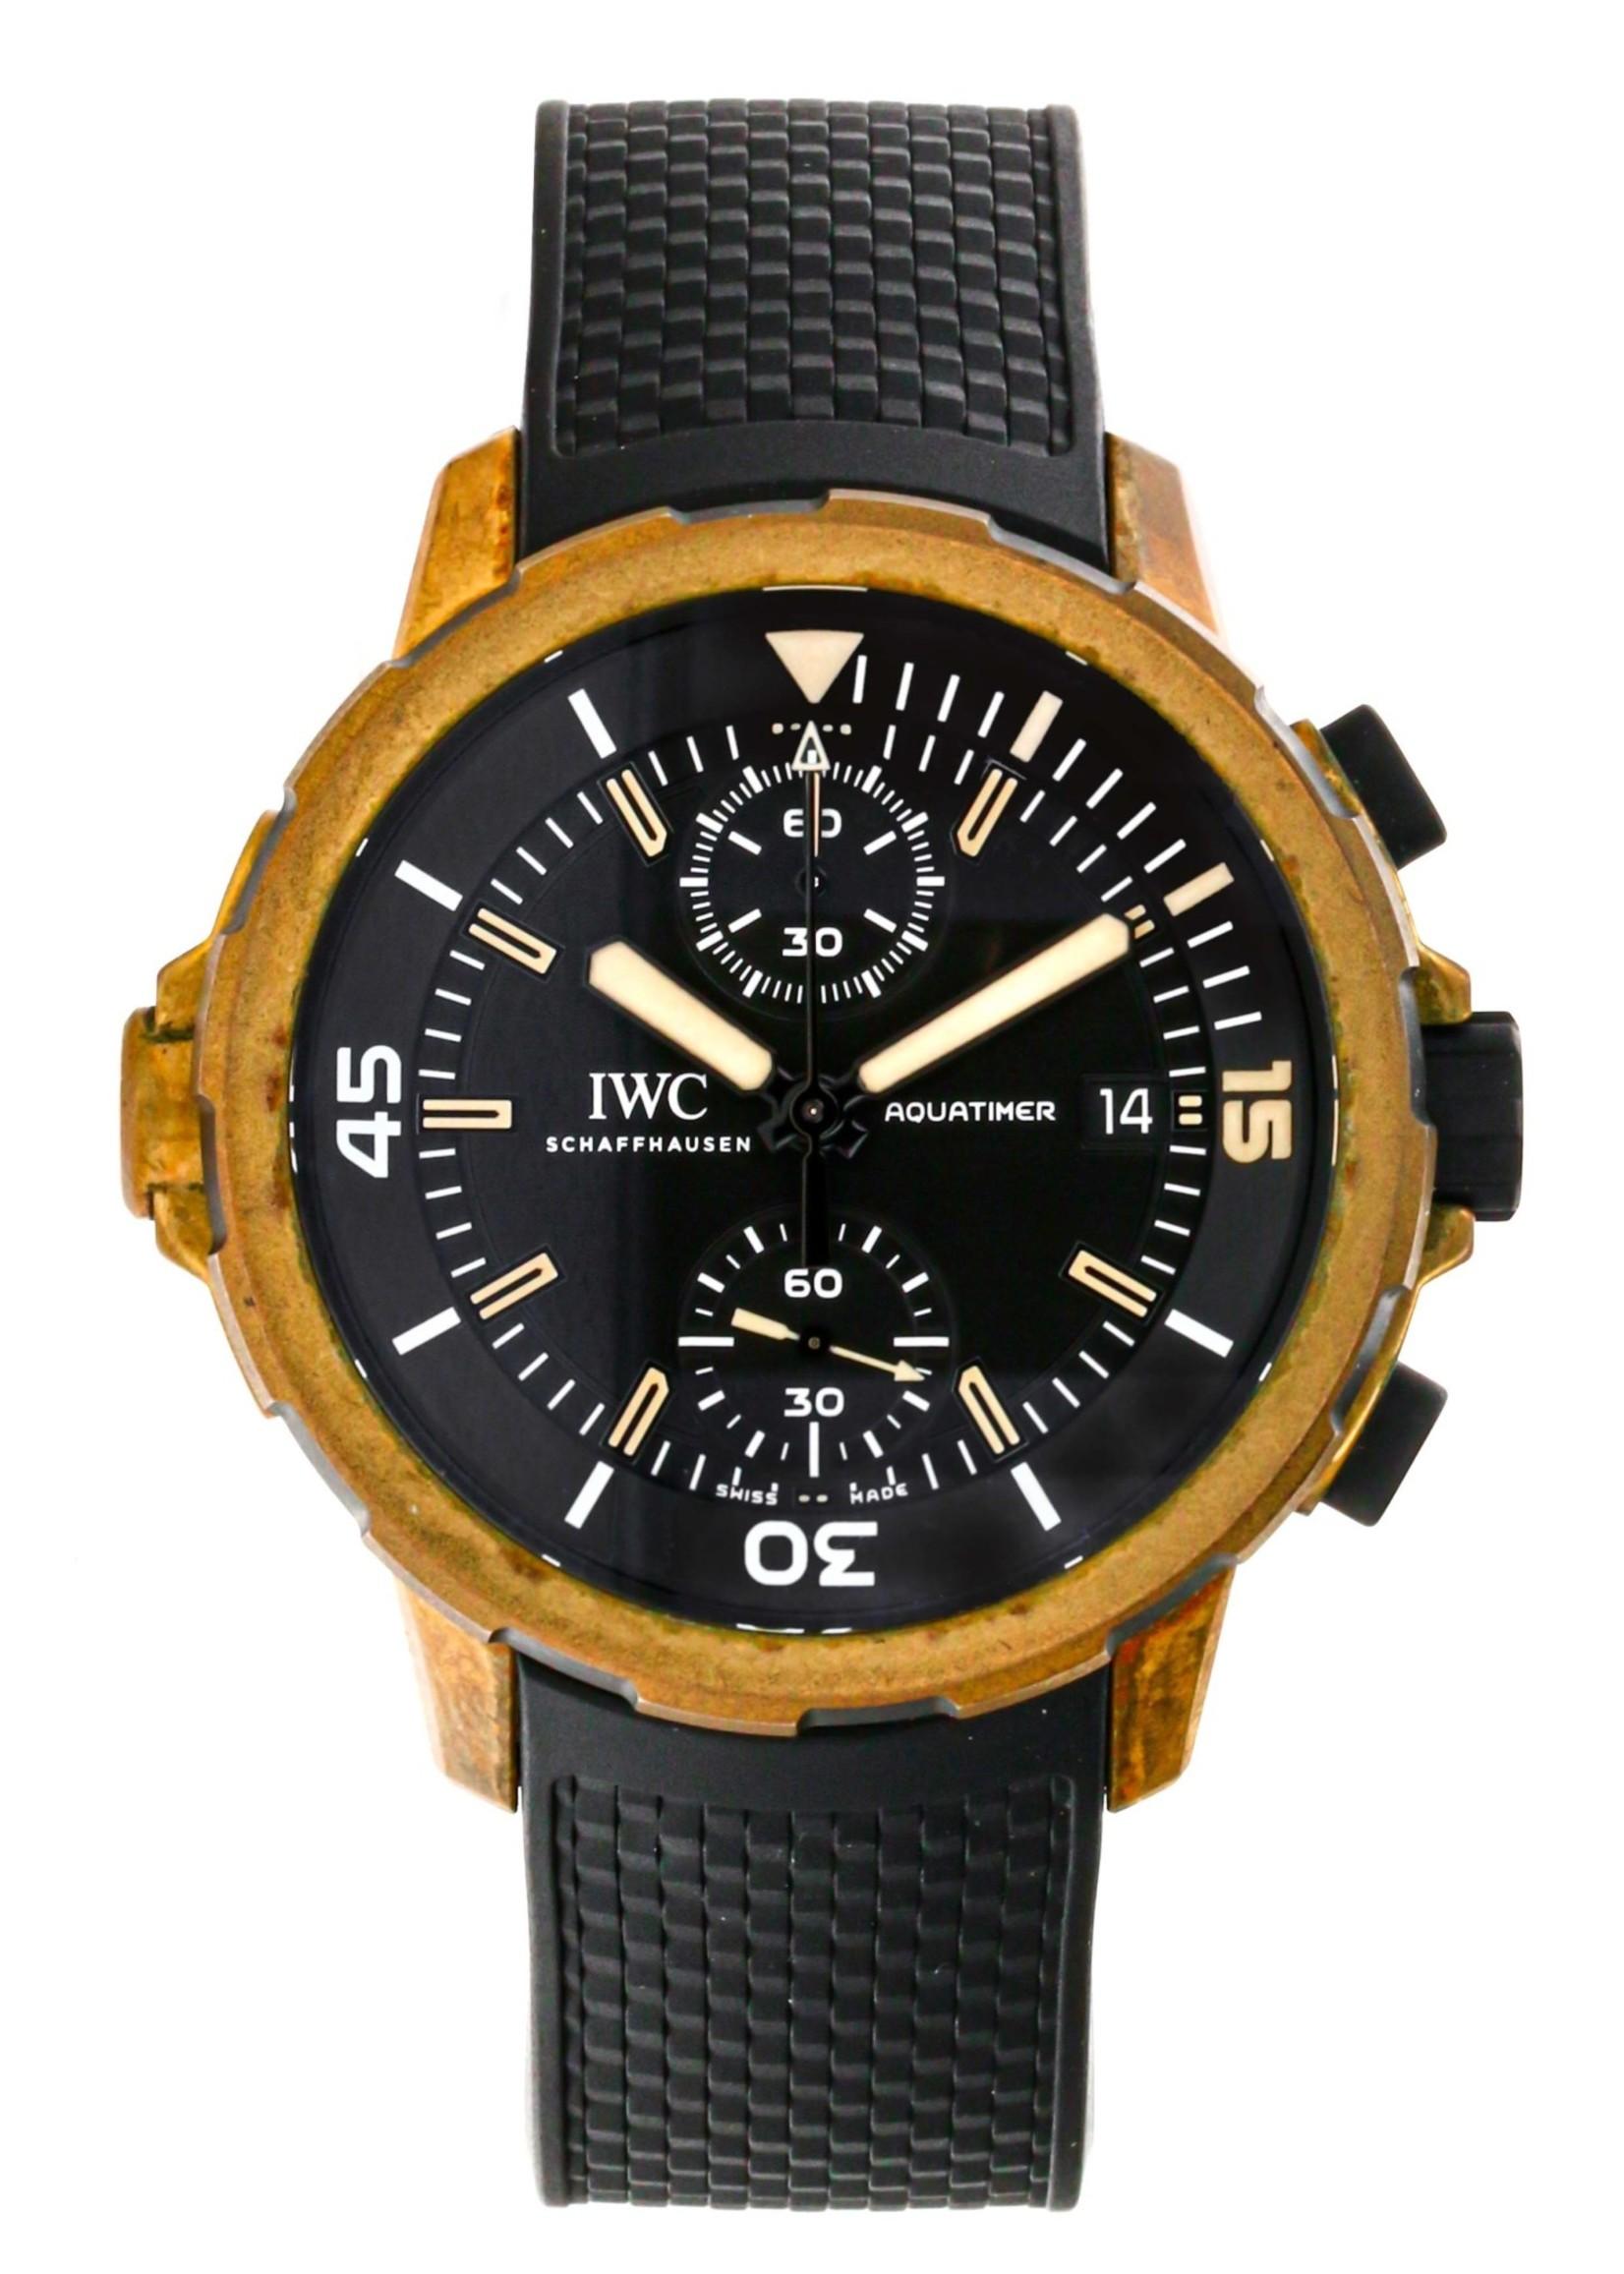 IWC IWC Aquatimer #IW379503 (2019 B+P)